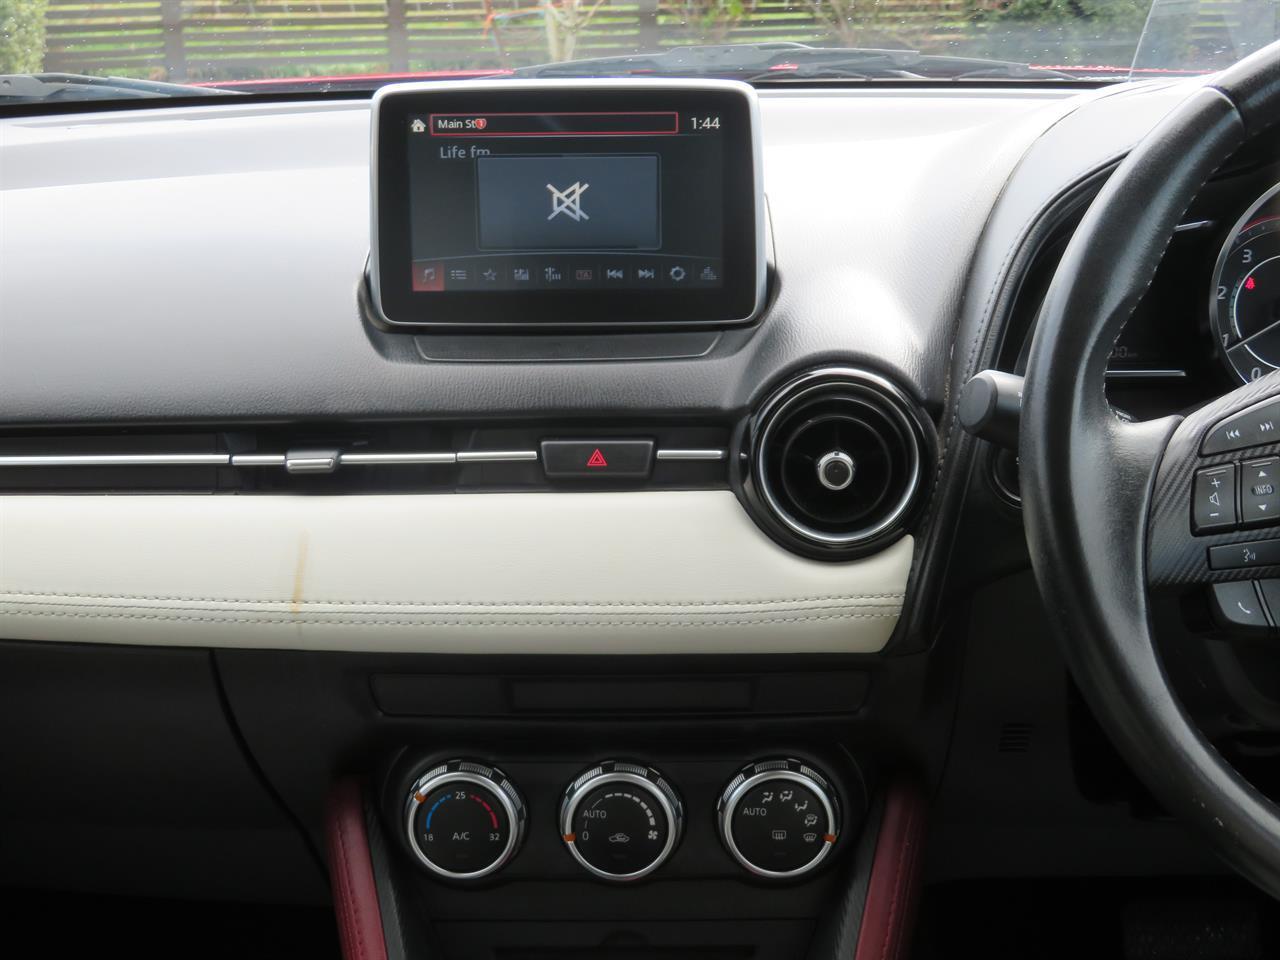 image-12, 2015 Mazda CX-3 LTD AWD at Gore